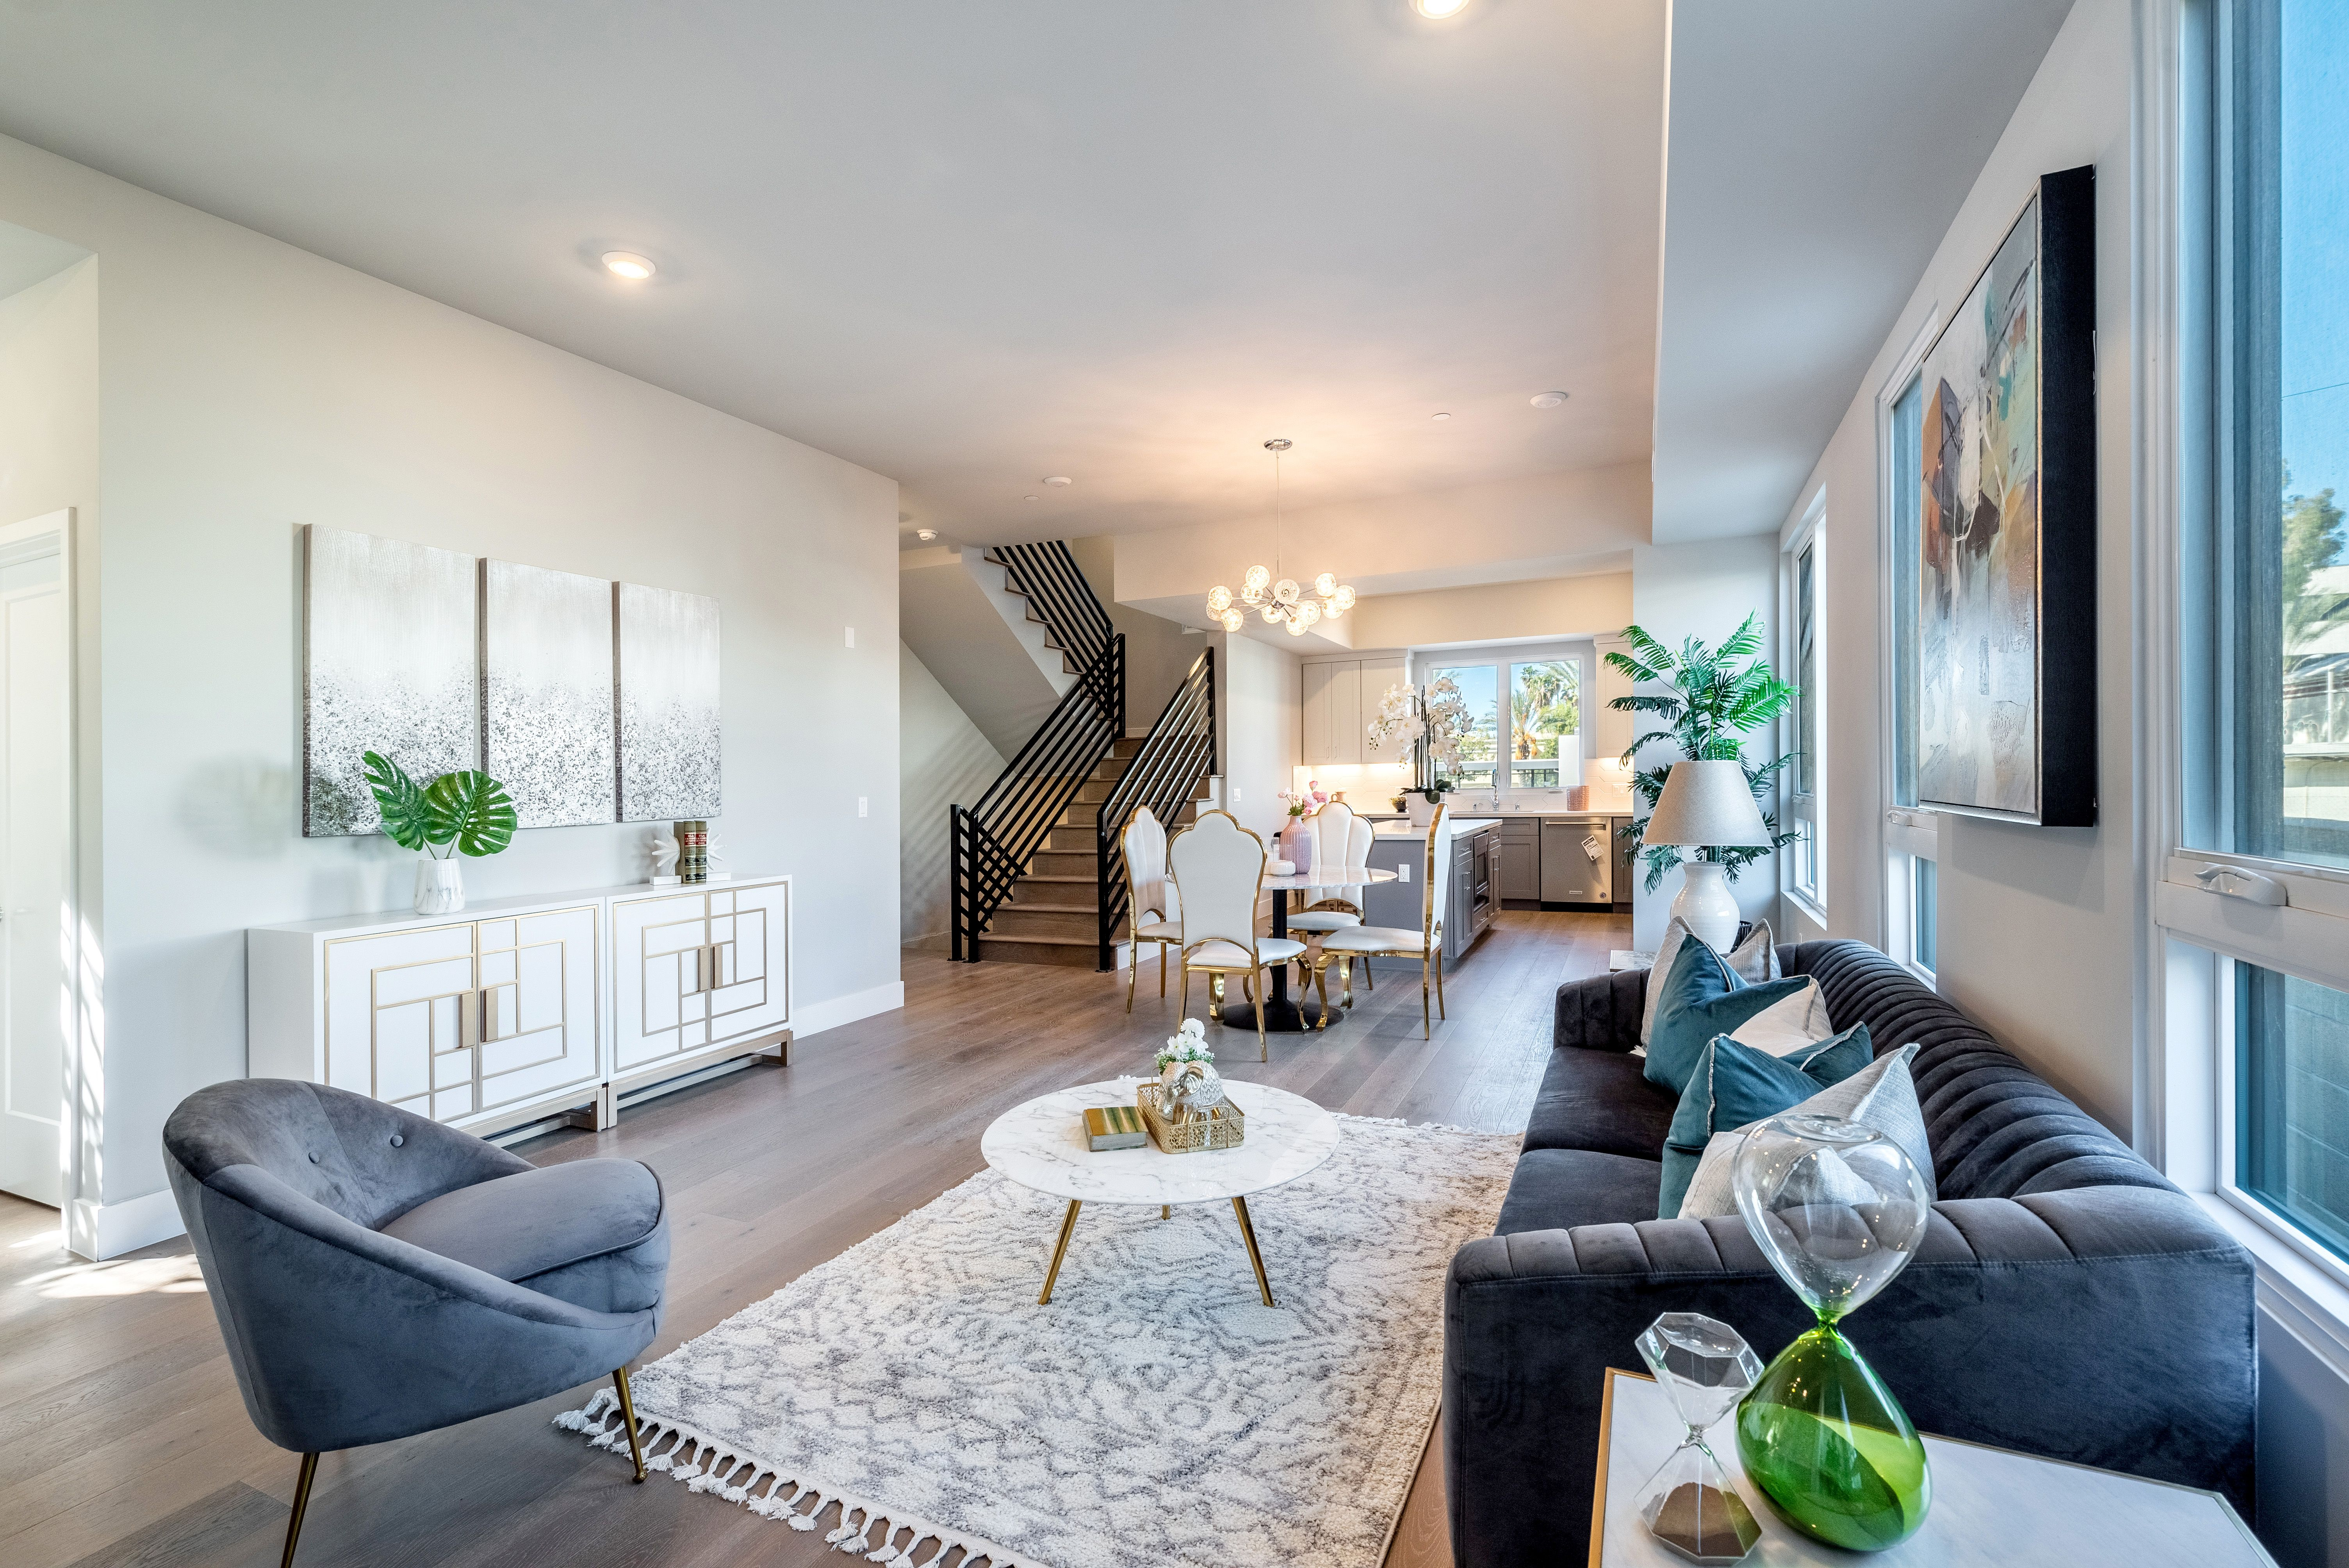 Living Area featured in the Unit 6 By Marengo Villa Pasadena  in Los Angeles, CA